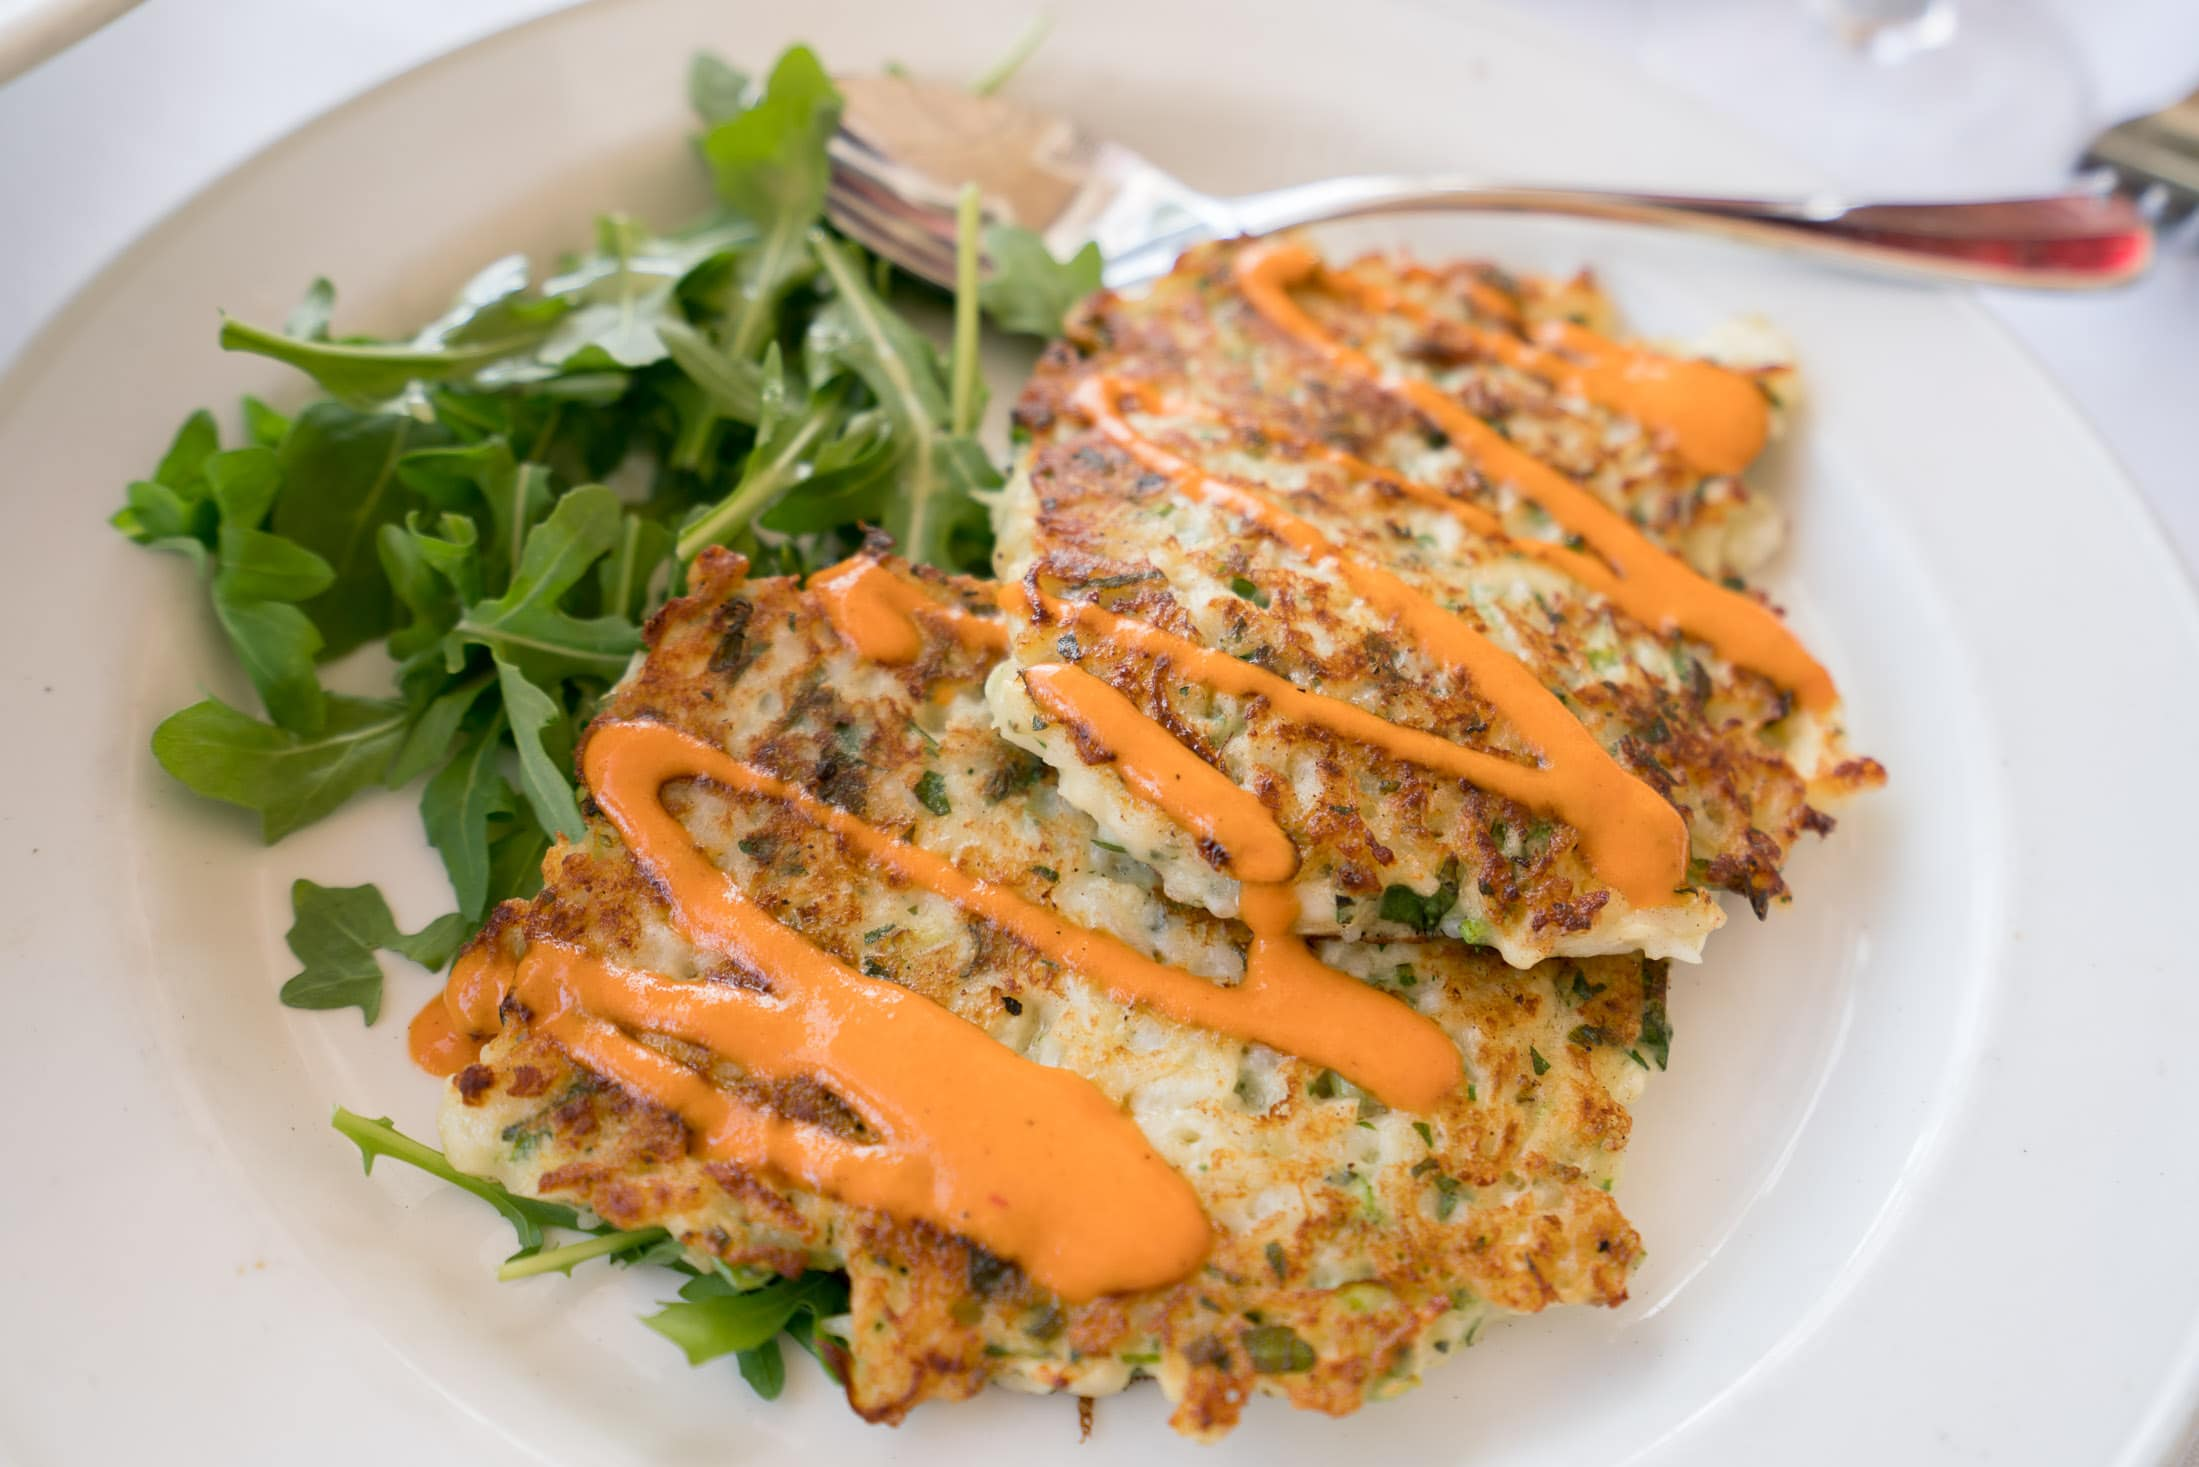 Piatti La Jolla appetizer - herbed cauliflower